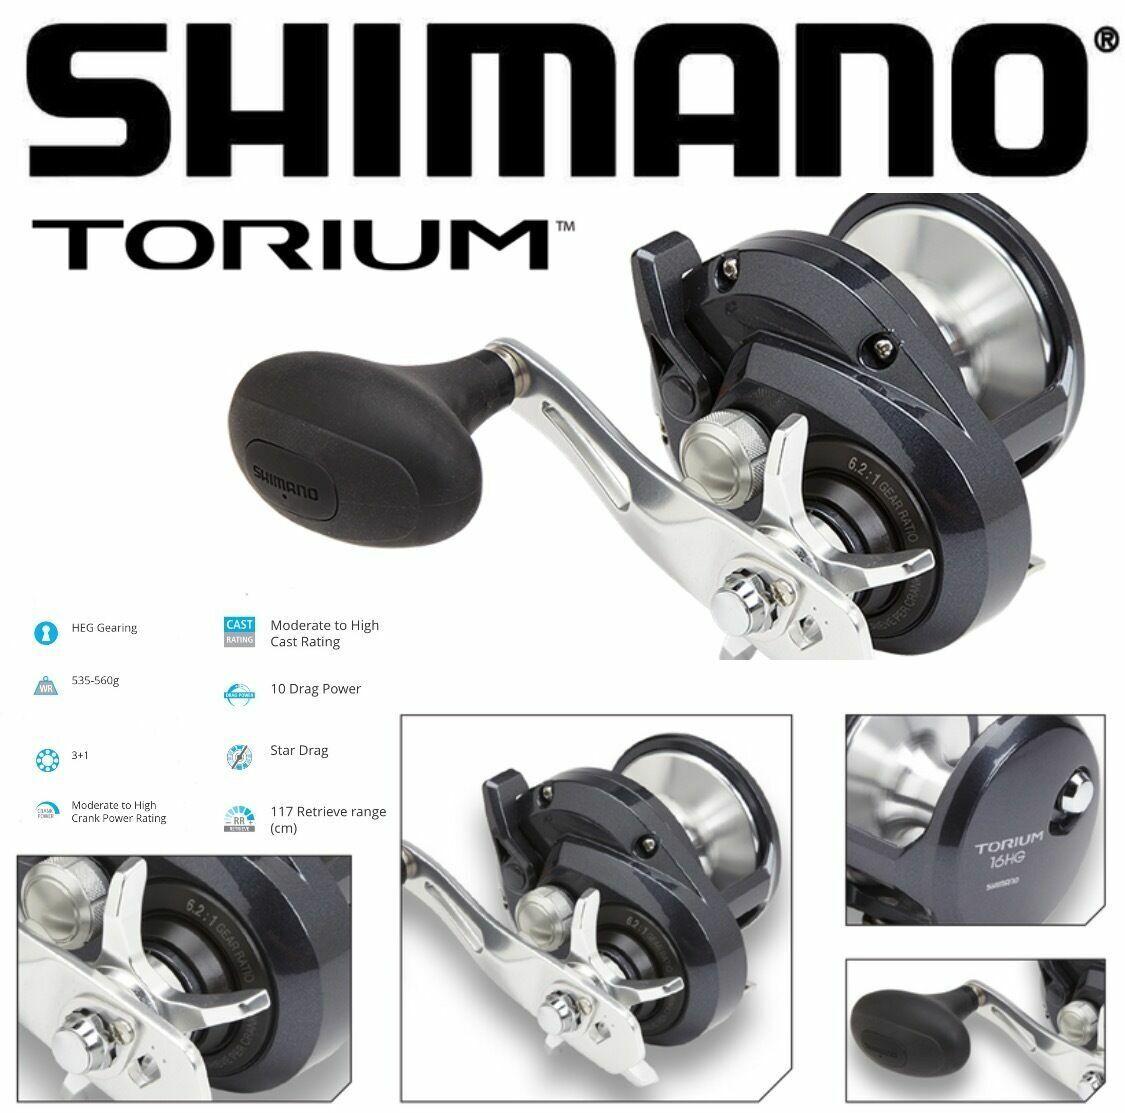 Shimano Baitcasting Hi Speed Cocheretes Torium hga & hgal